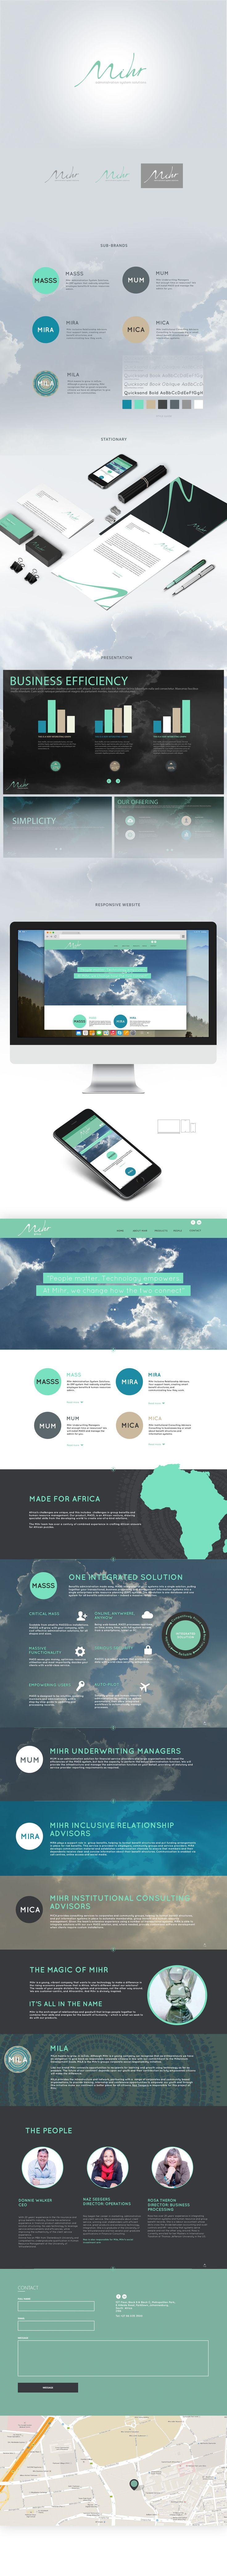 Brand Development for Mihr,